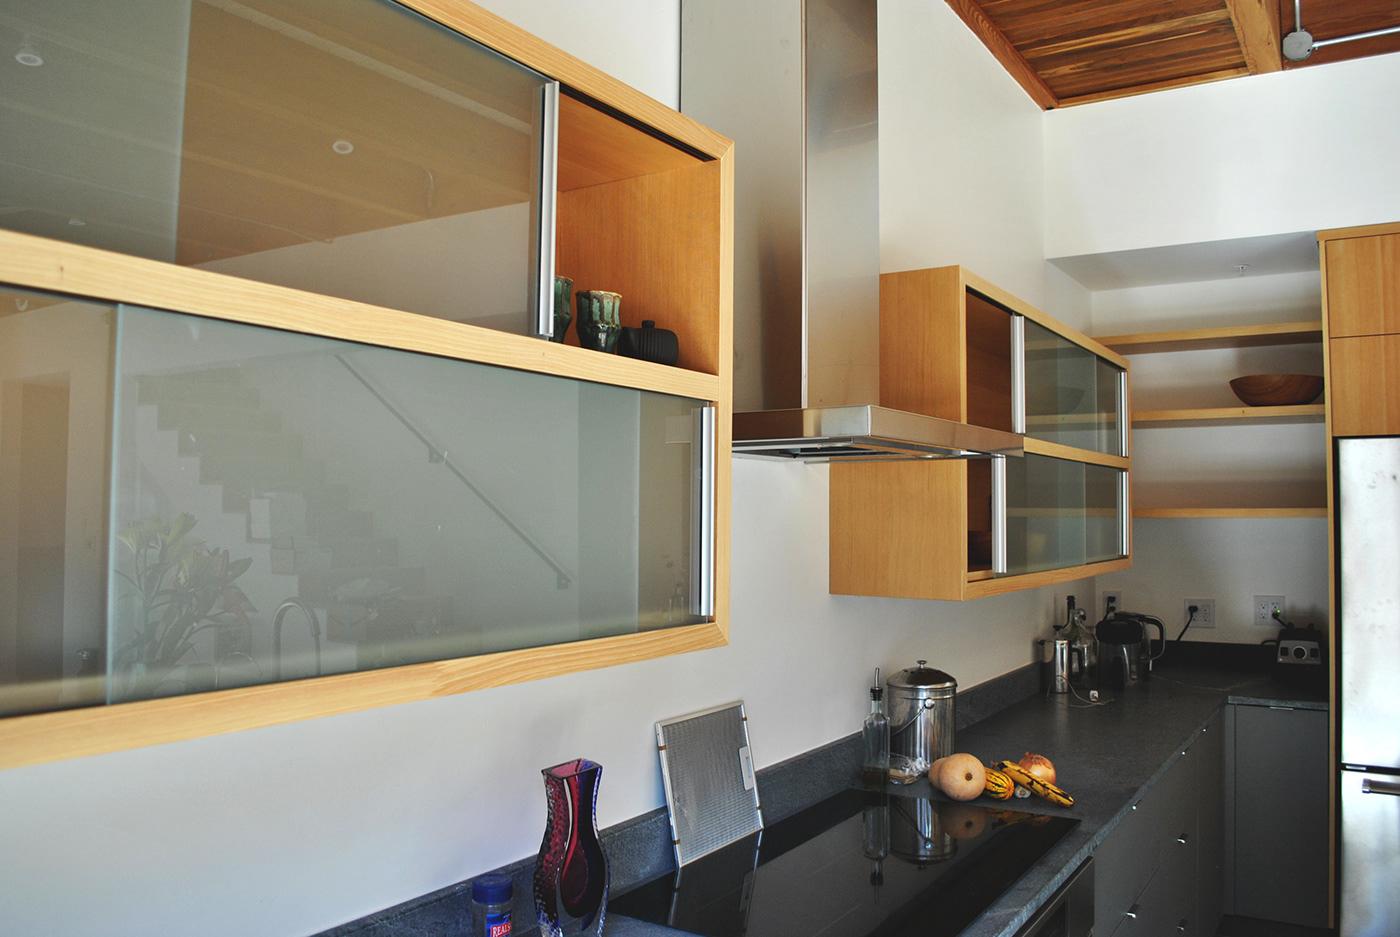 Image may contain: wall, indoor and countertop